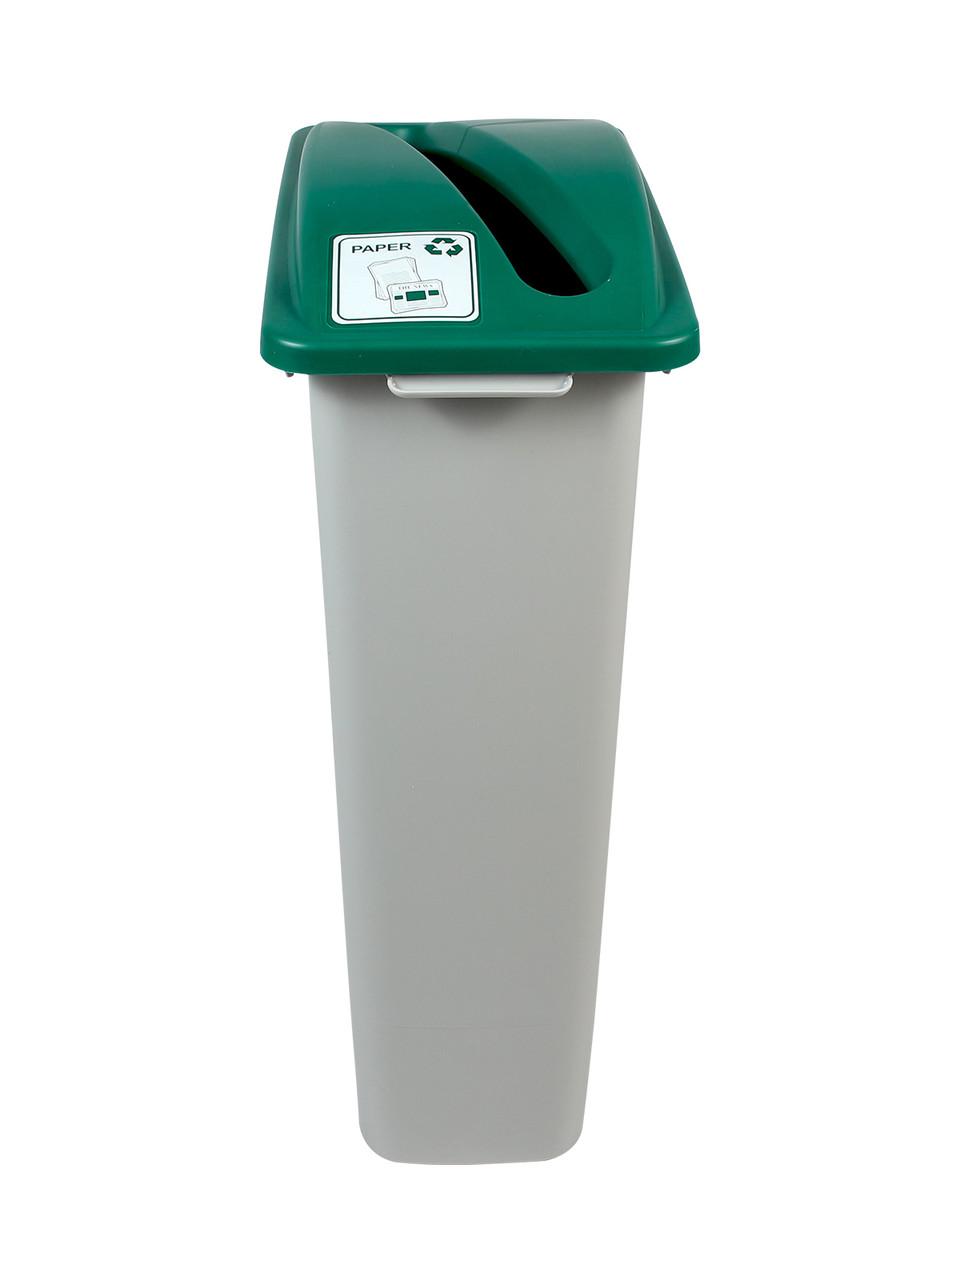 23 Gallon Skinny Simple Sort Recycle Bin Green Lid